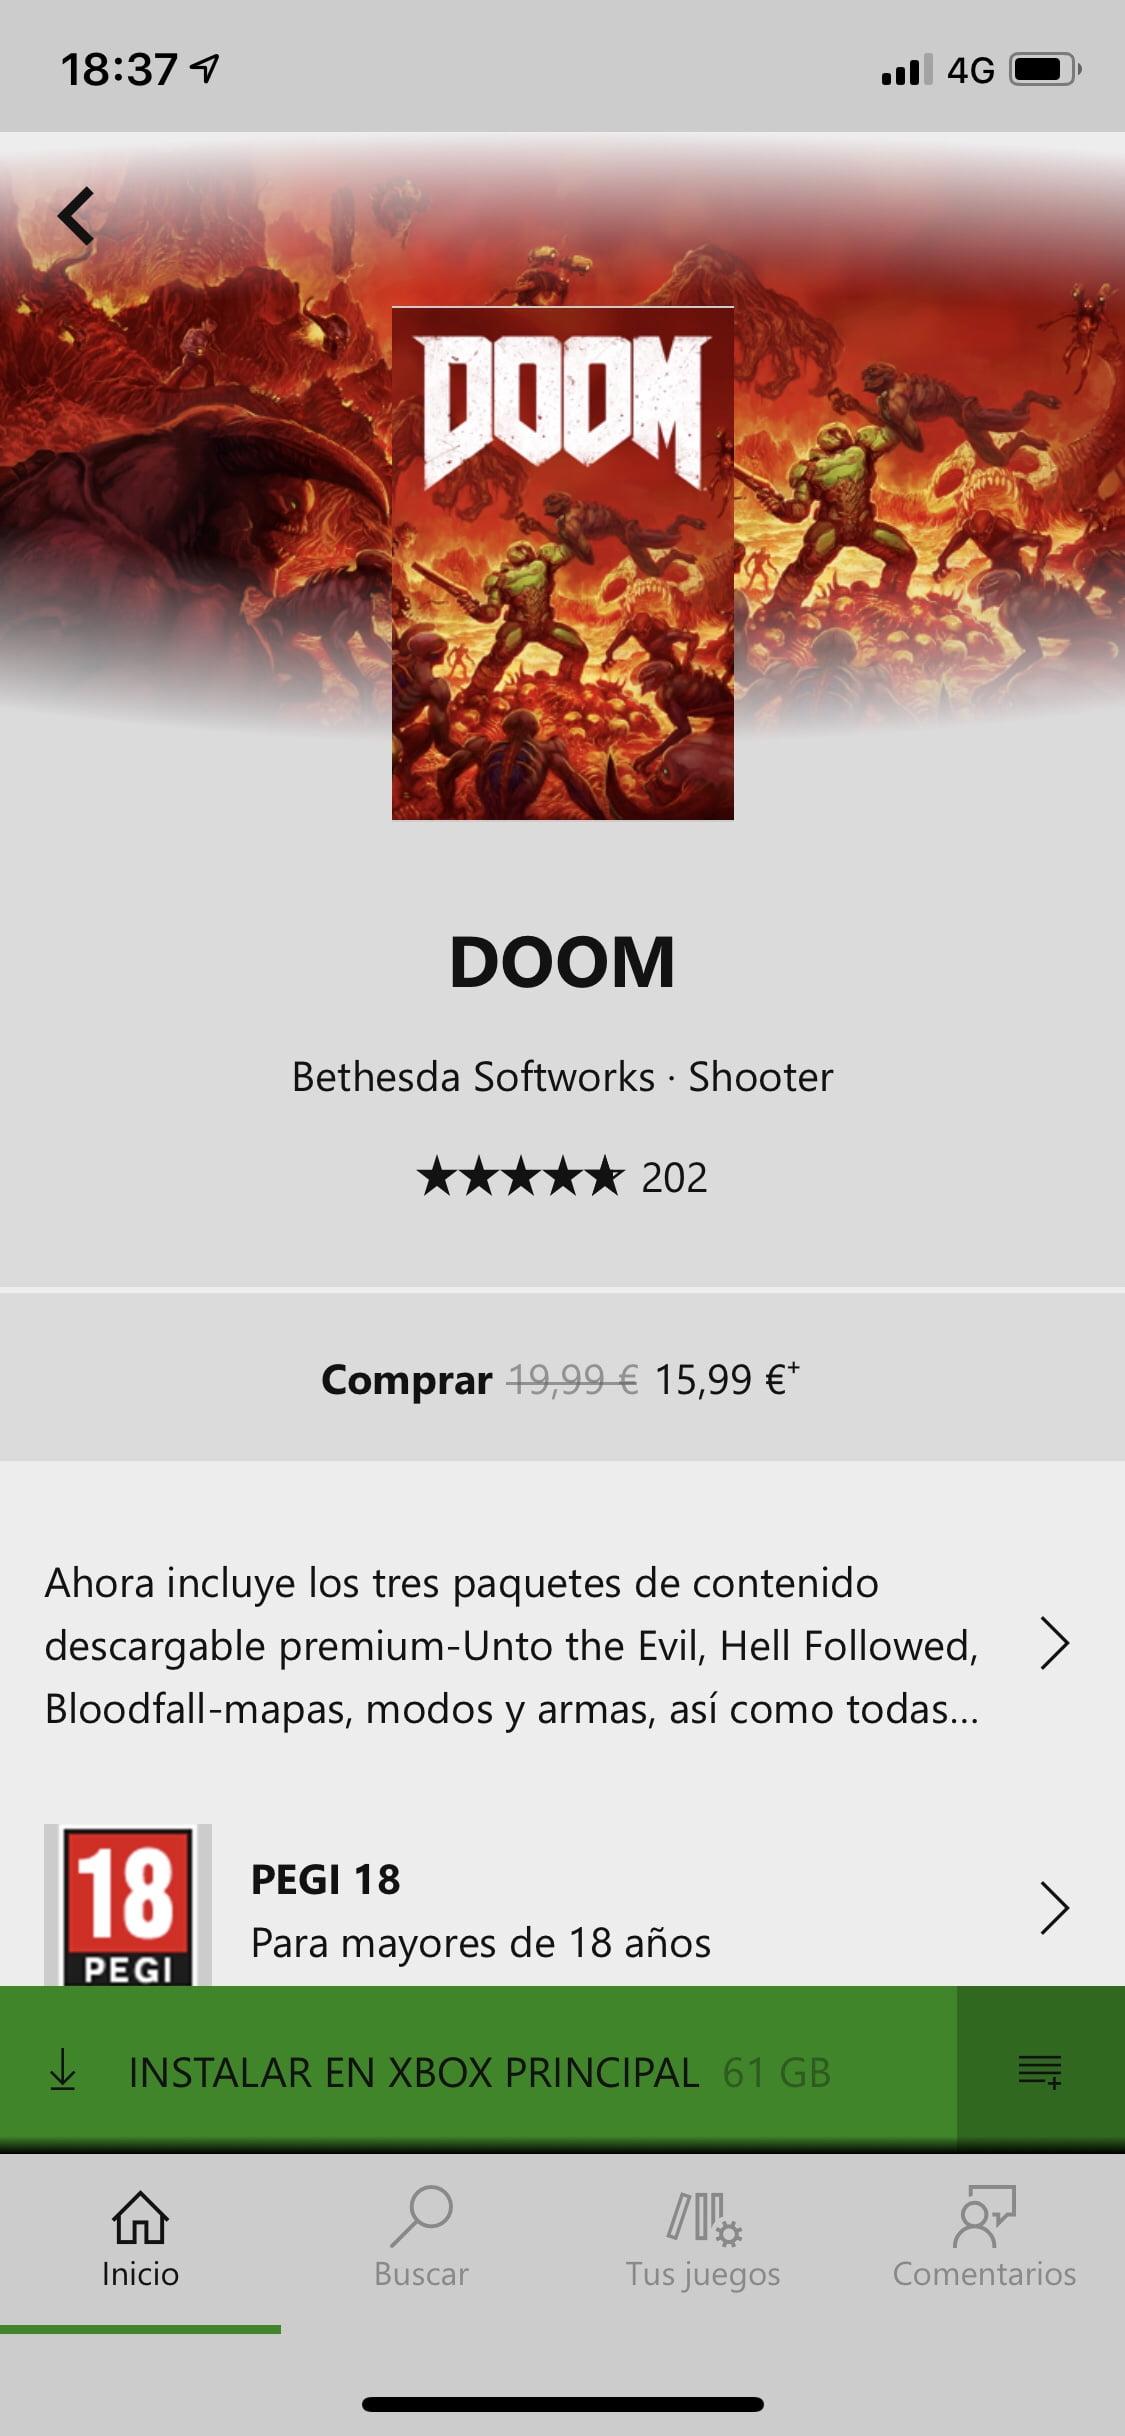 Opción de instalar en mi Xbox Game Pass para iOS